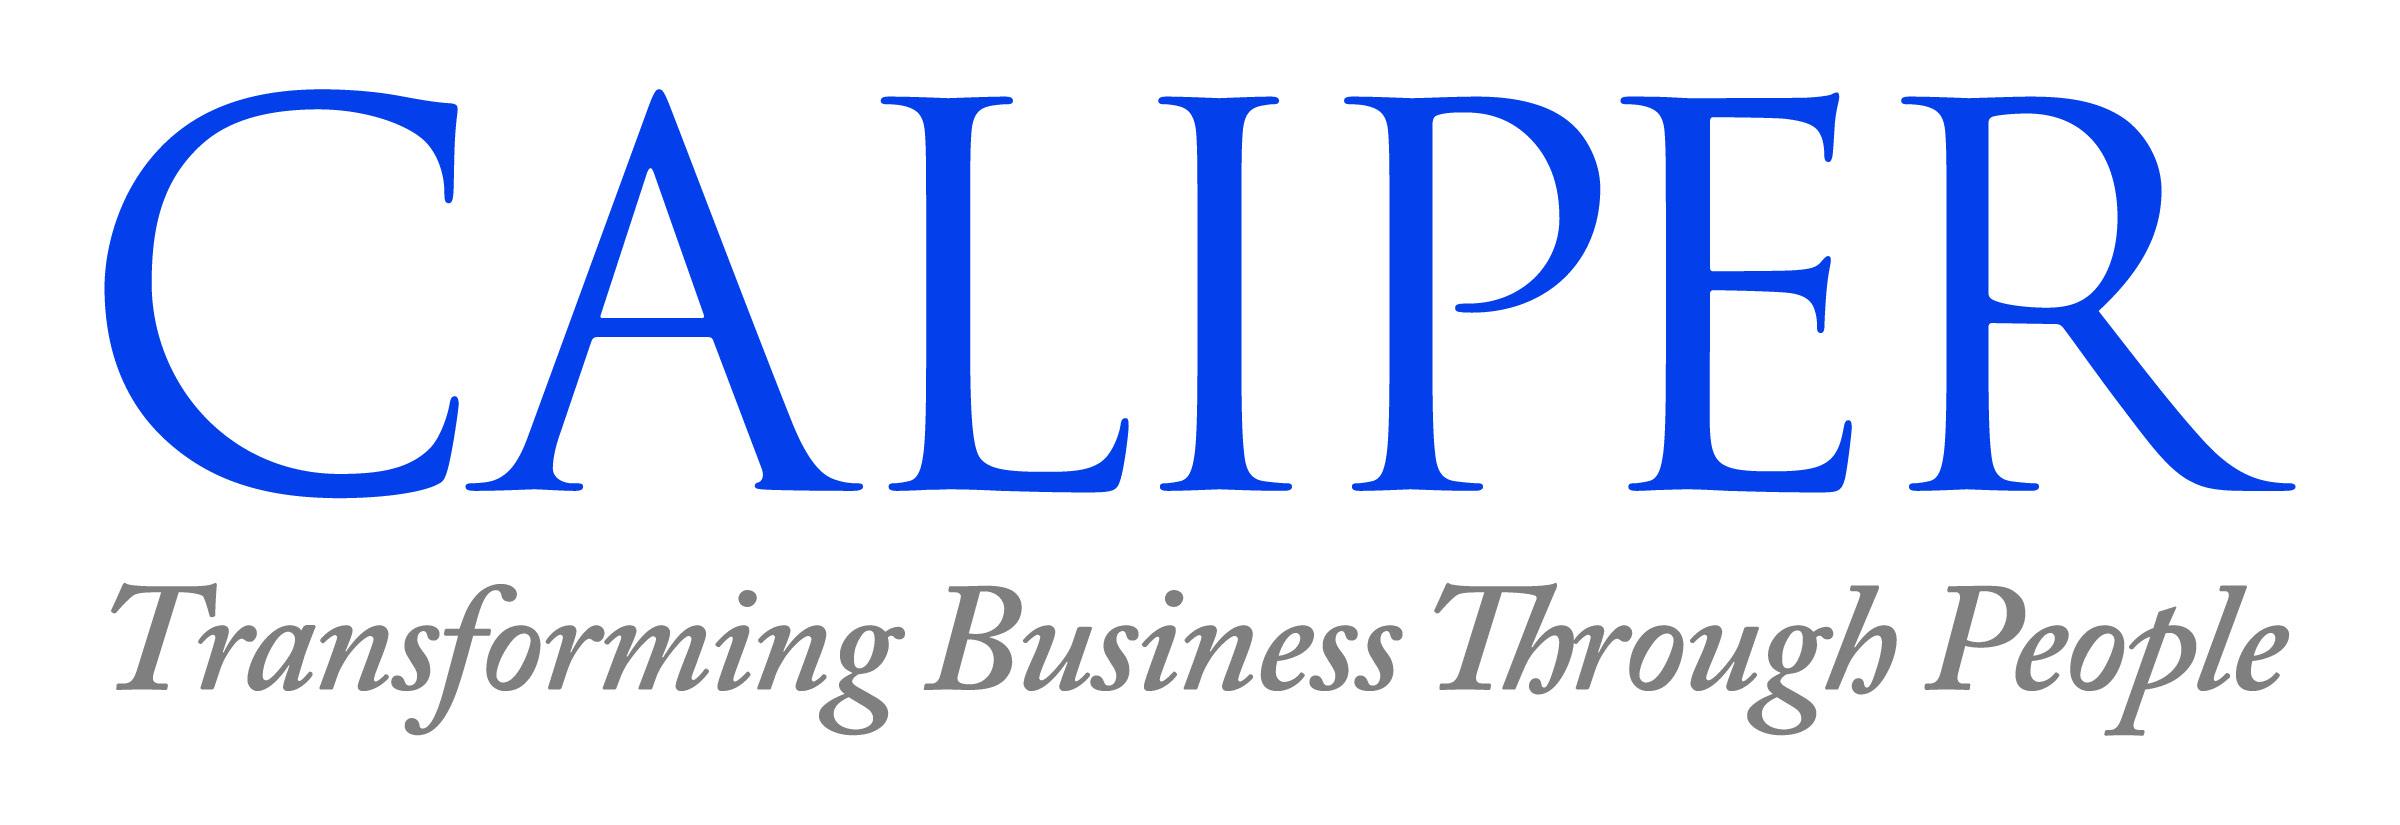 Caliper - Transforming Business Through People